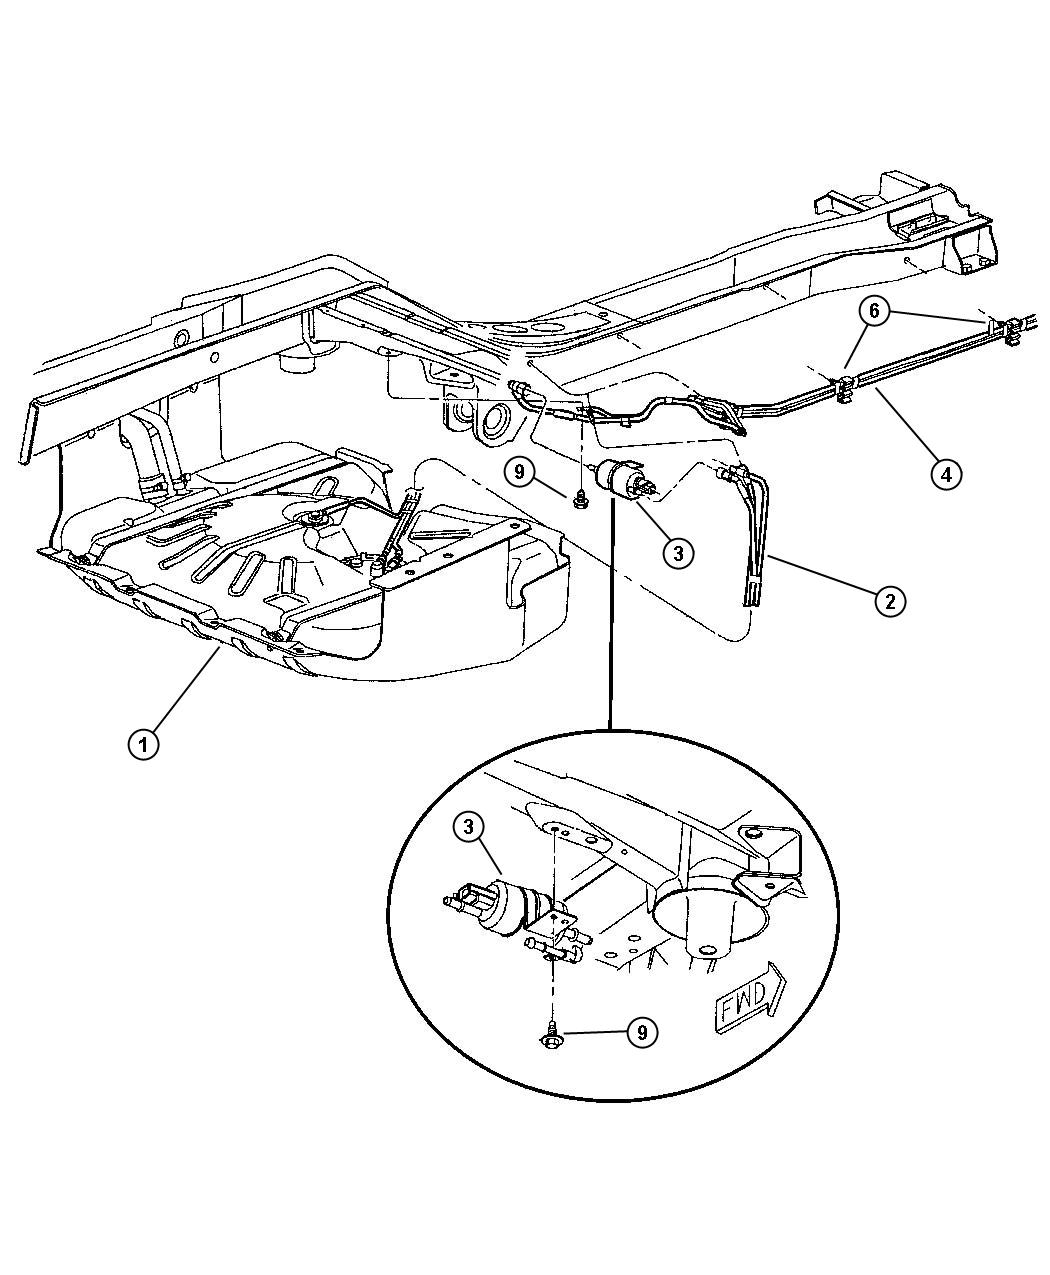 Jeep Commander Filter Fuel Lines Engine Rear